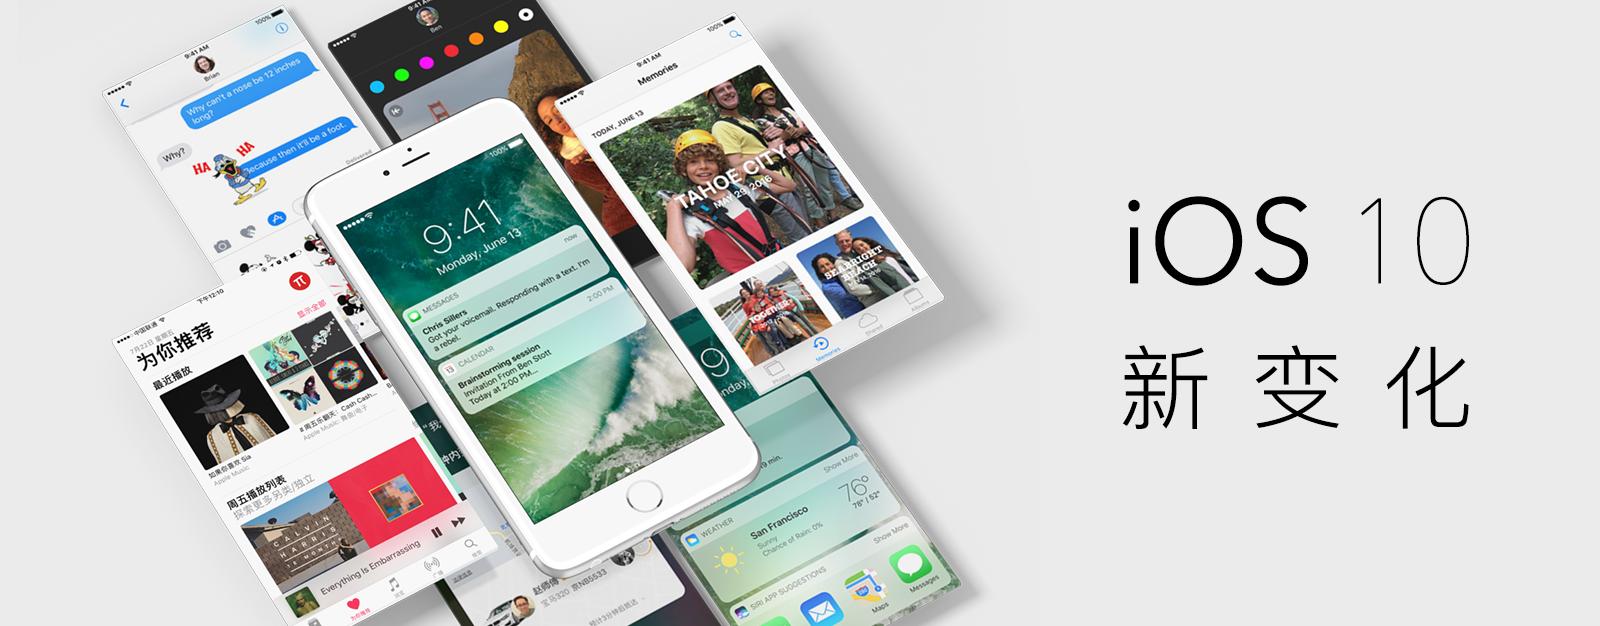 iOS 10 新变化